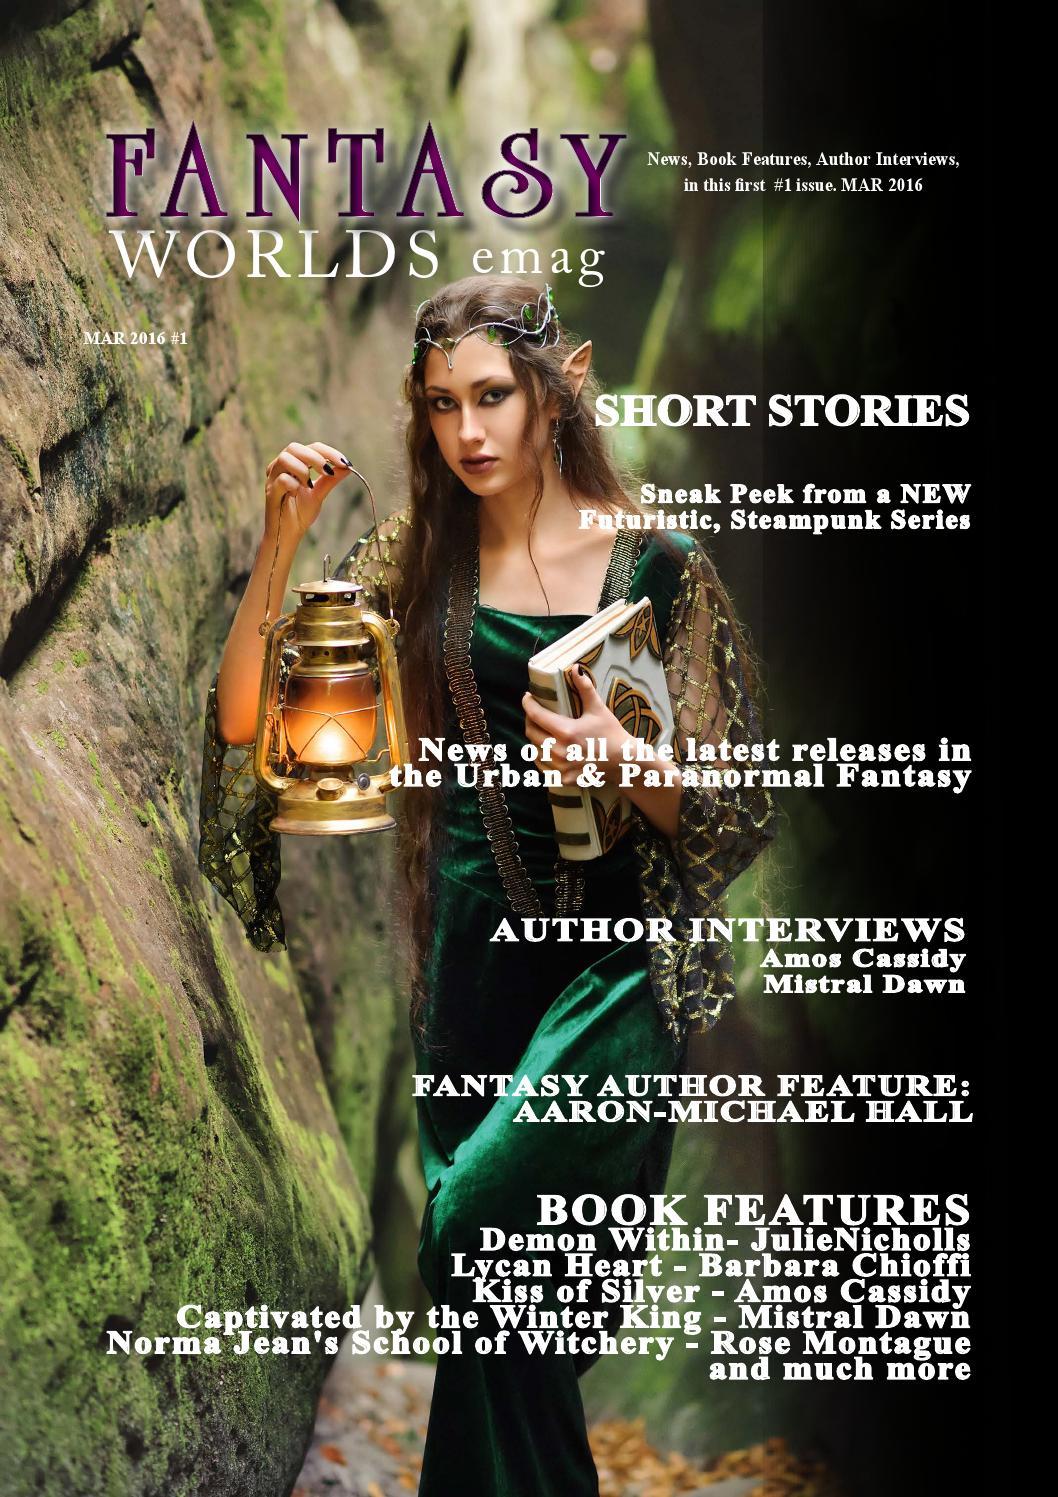 Fantasy worlds emag march 2016